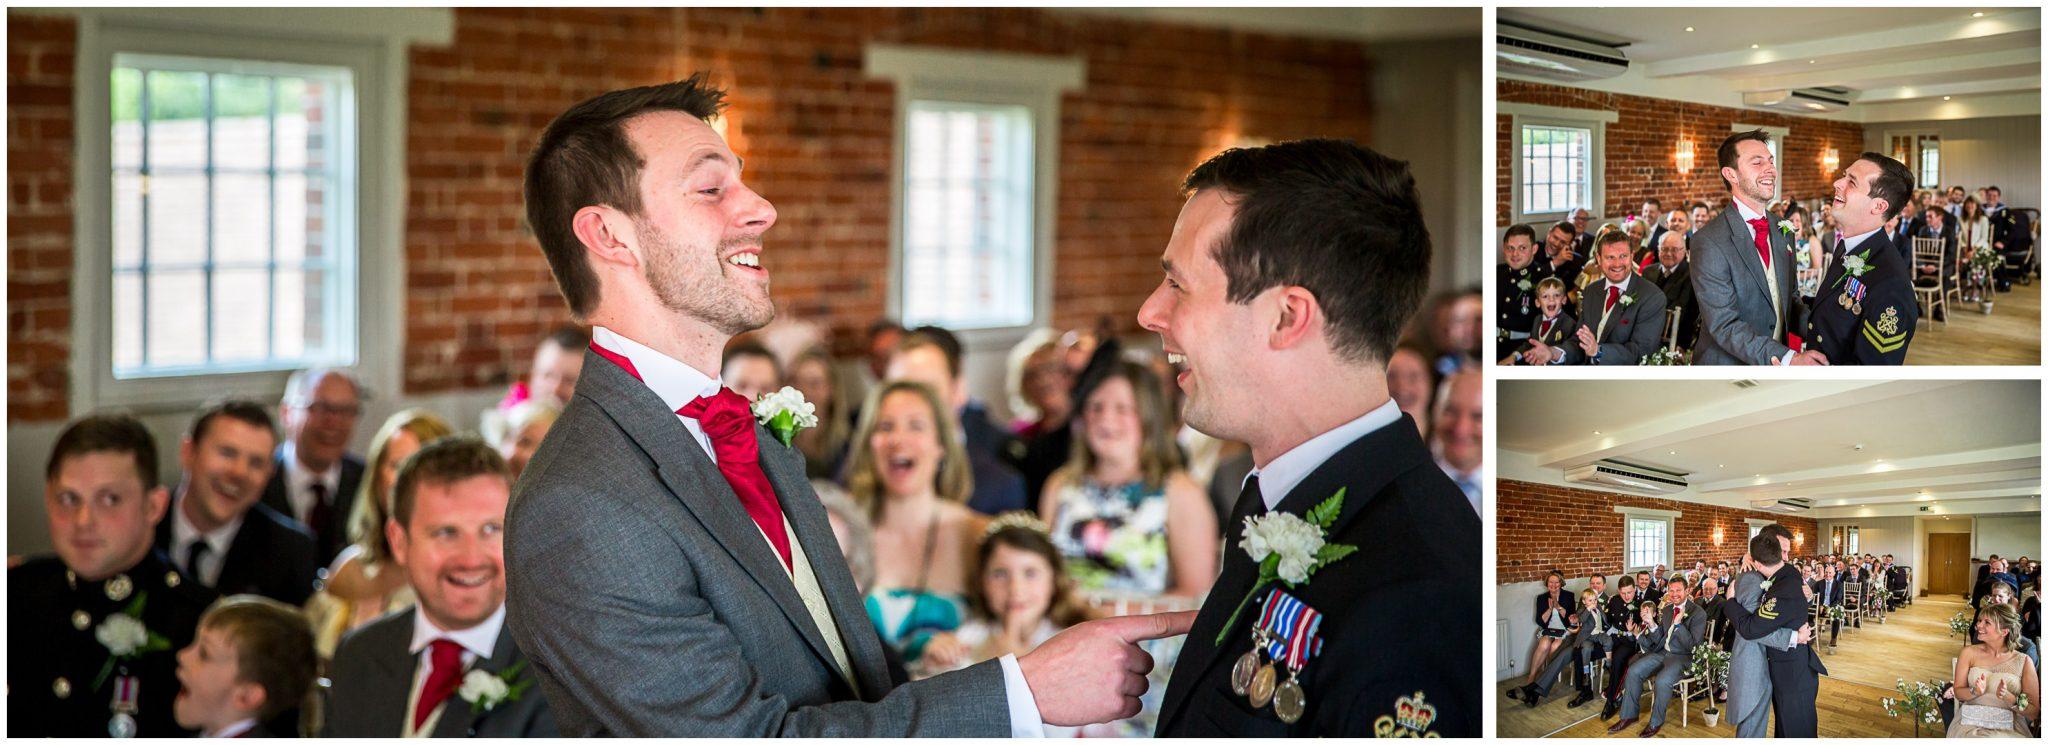 Sopley wedding photographer grooms embrace